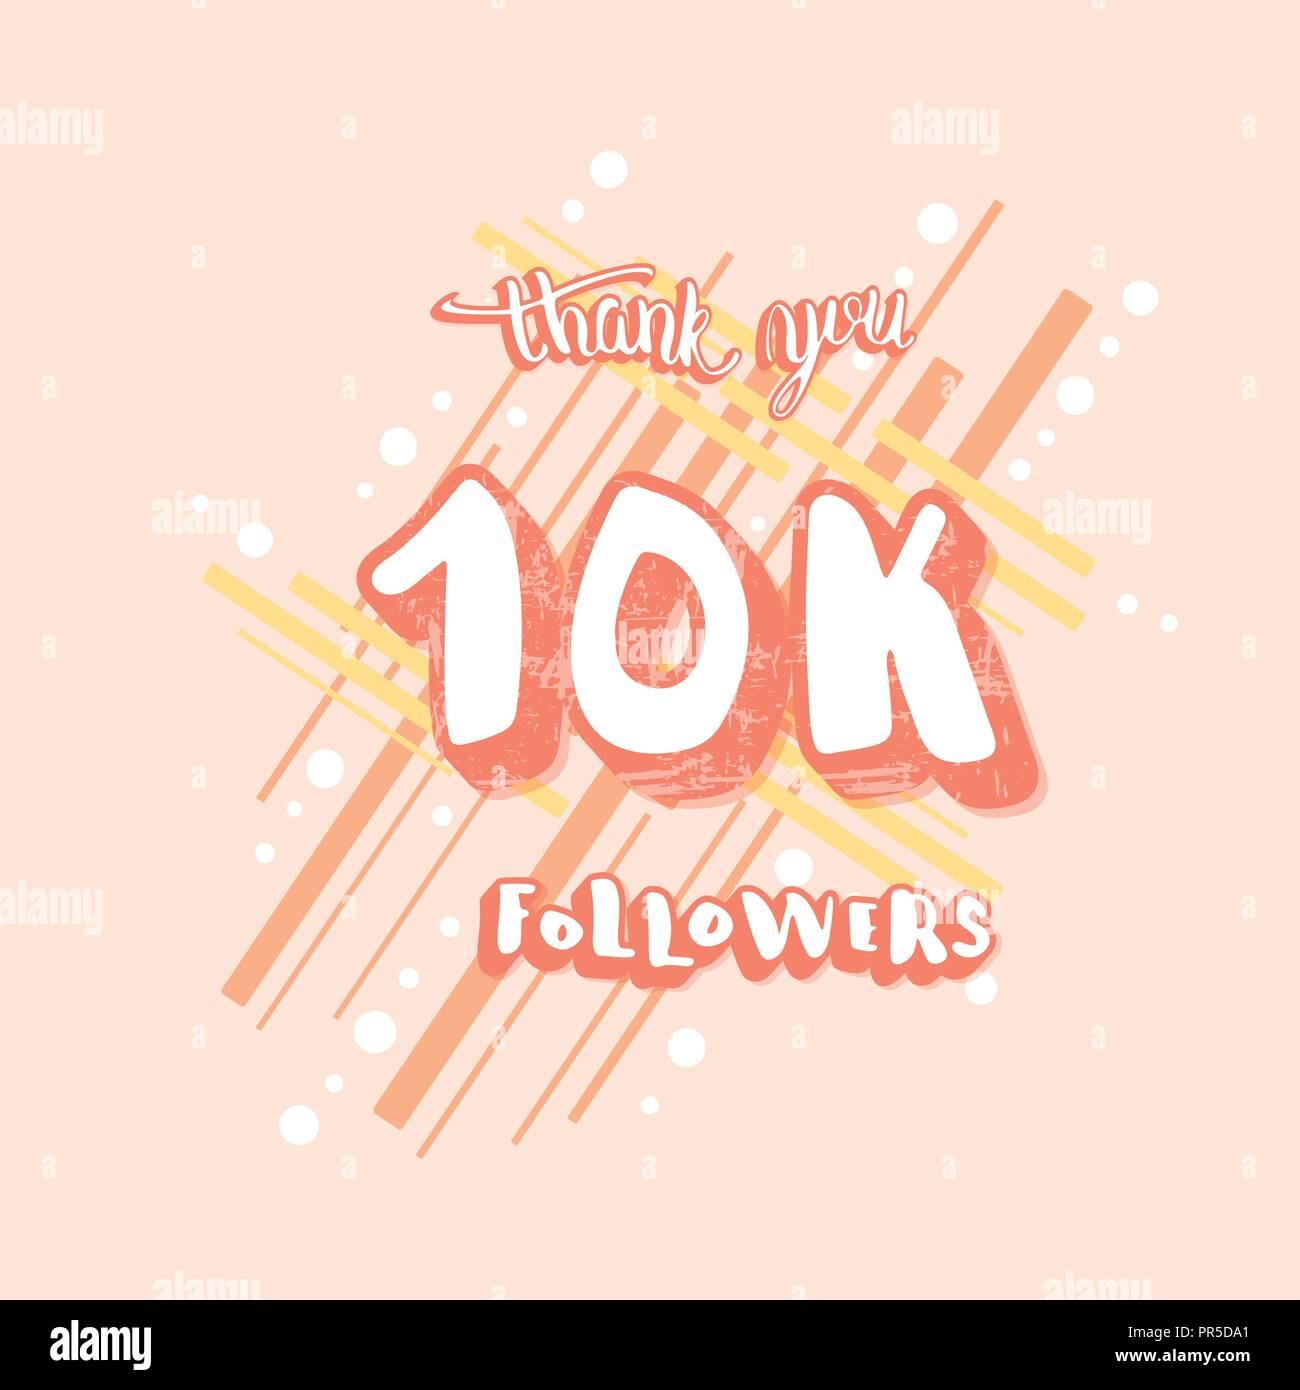 10k followers social media congratulation template trendy flat